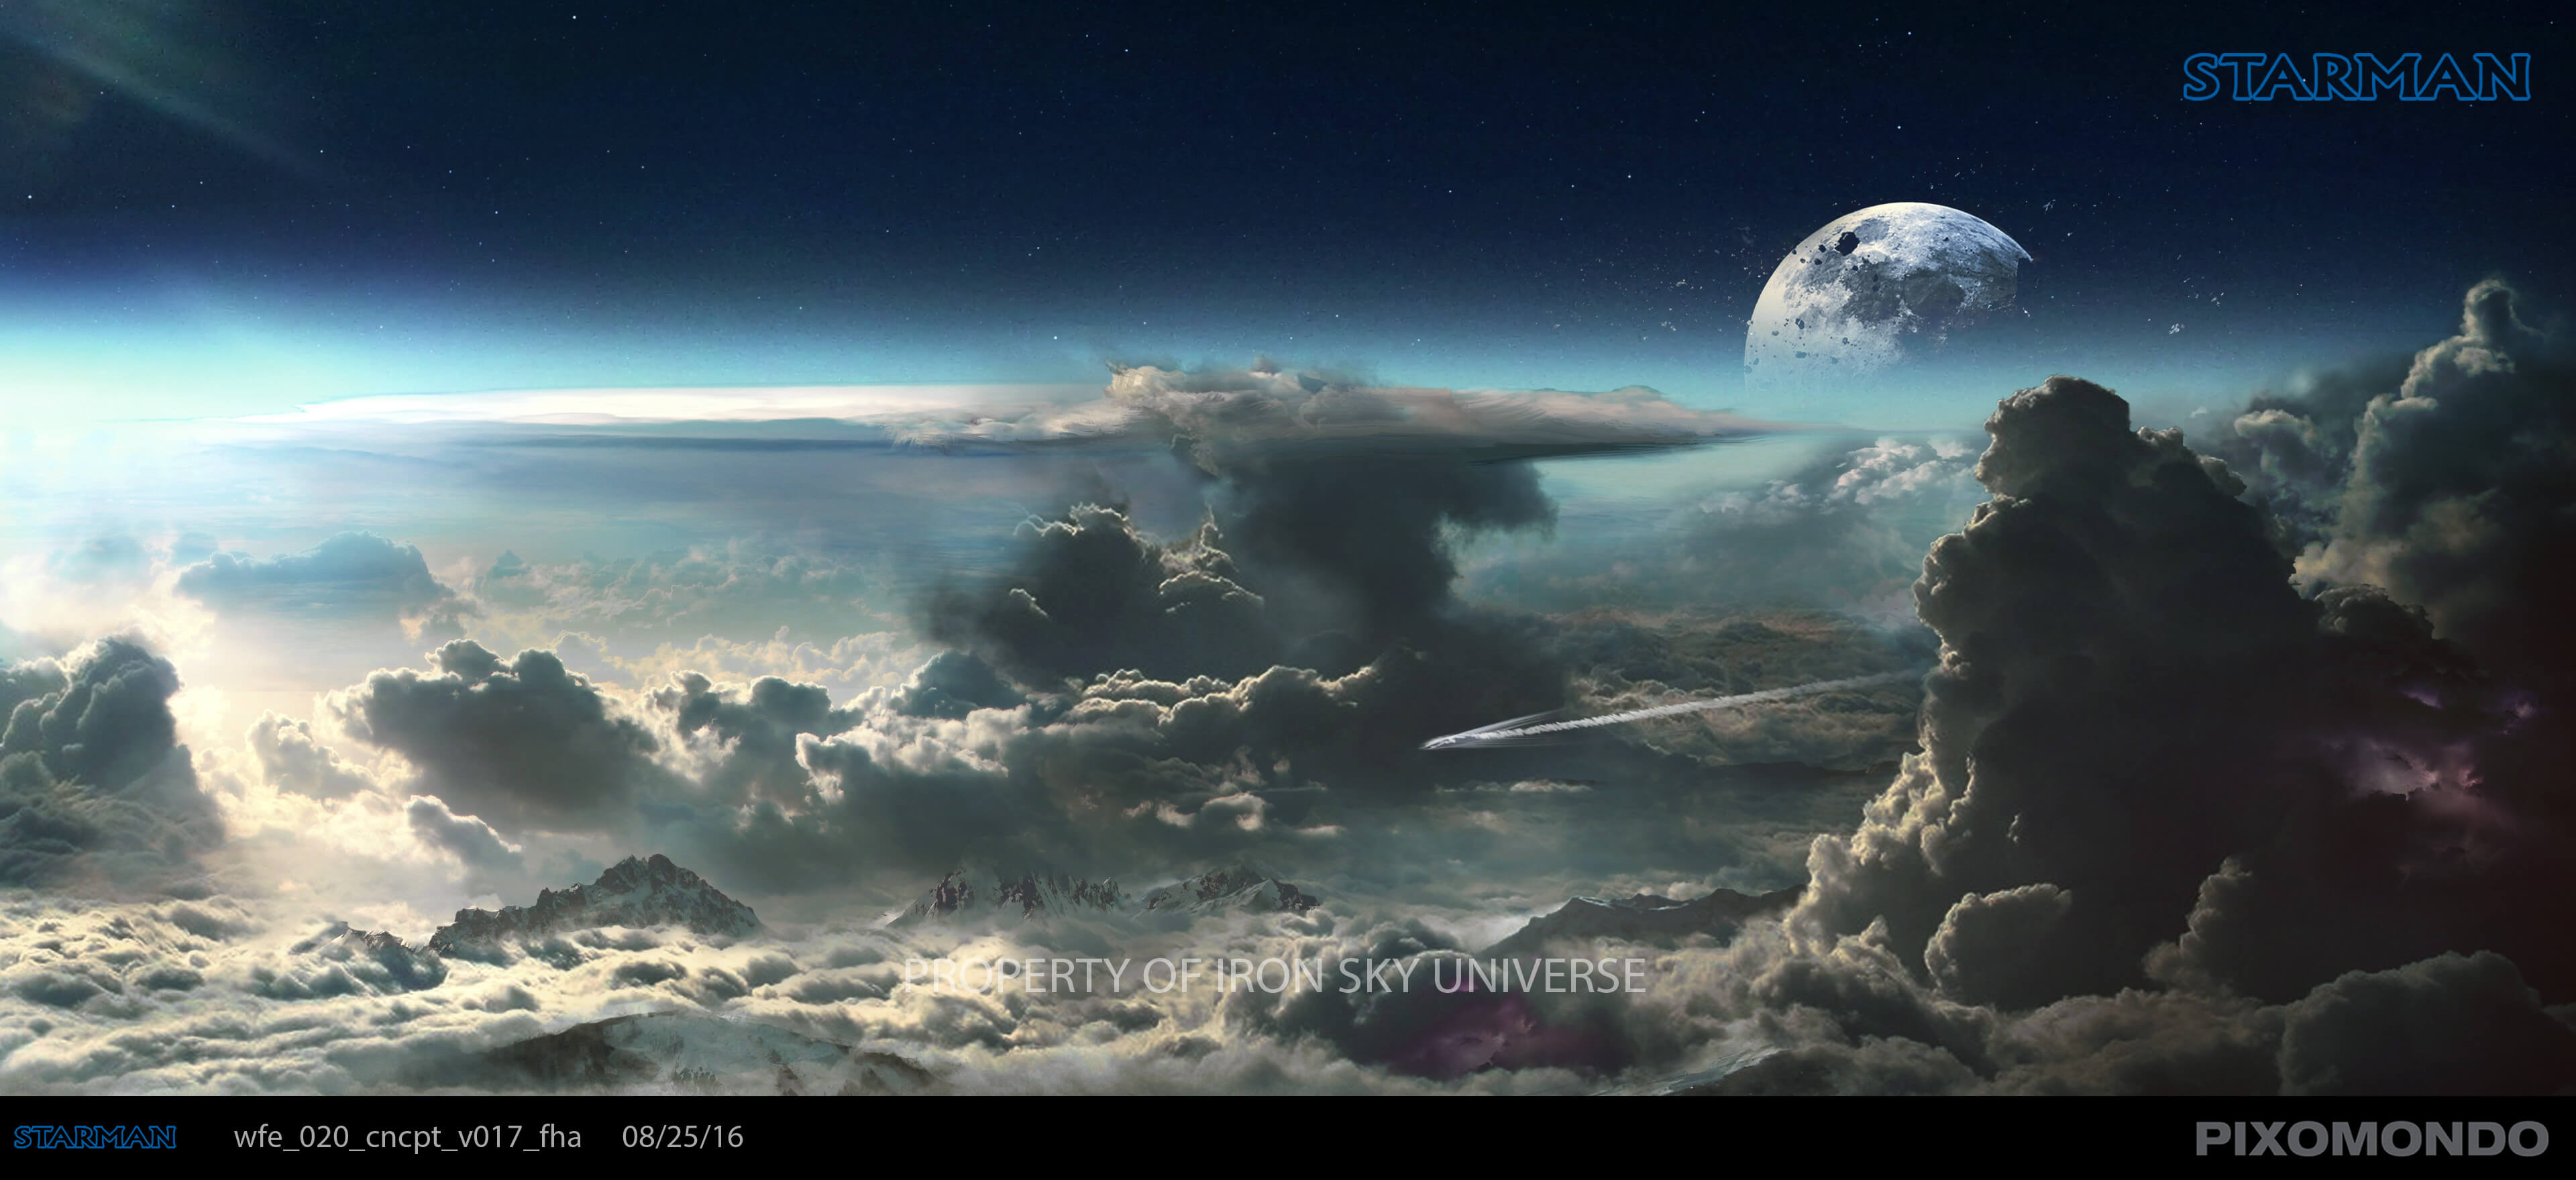 iron-sky-2-concept-art-walkyr-flying-earth-v017-pixomondo-felix-botho-haas.jpg.jpg